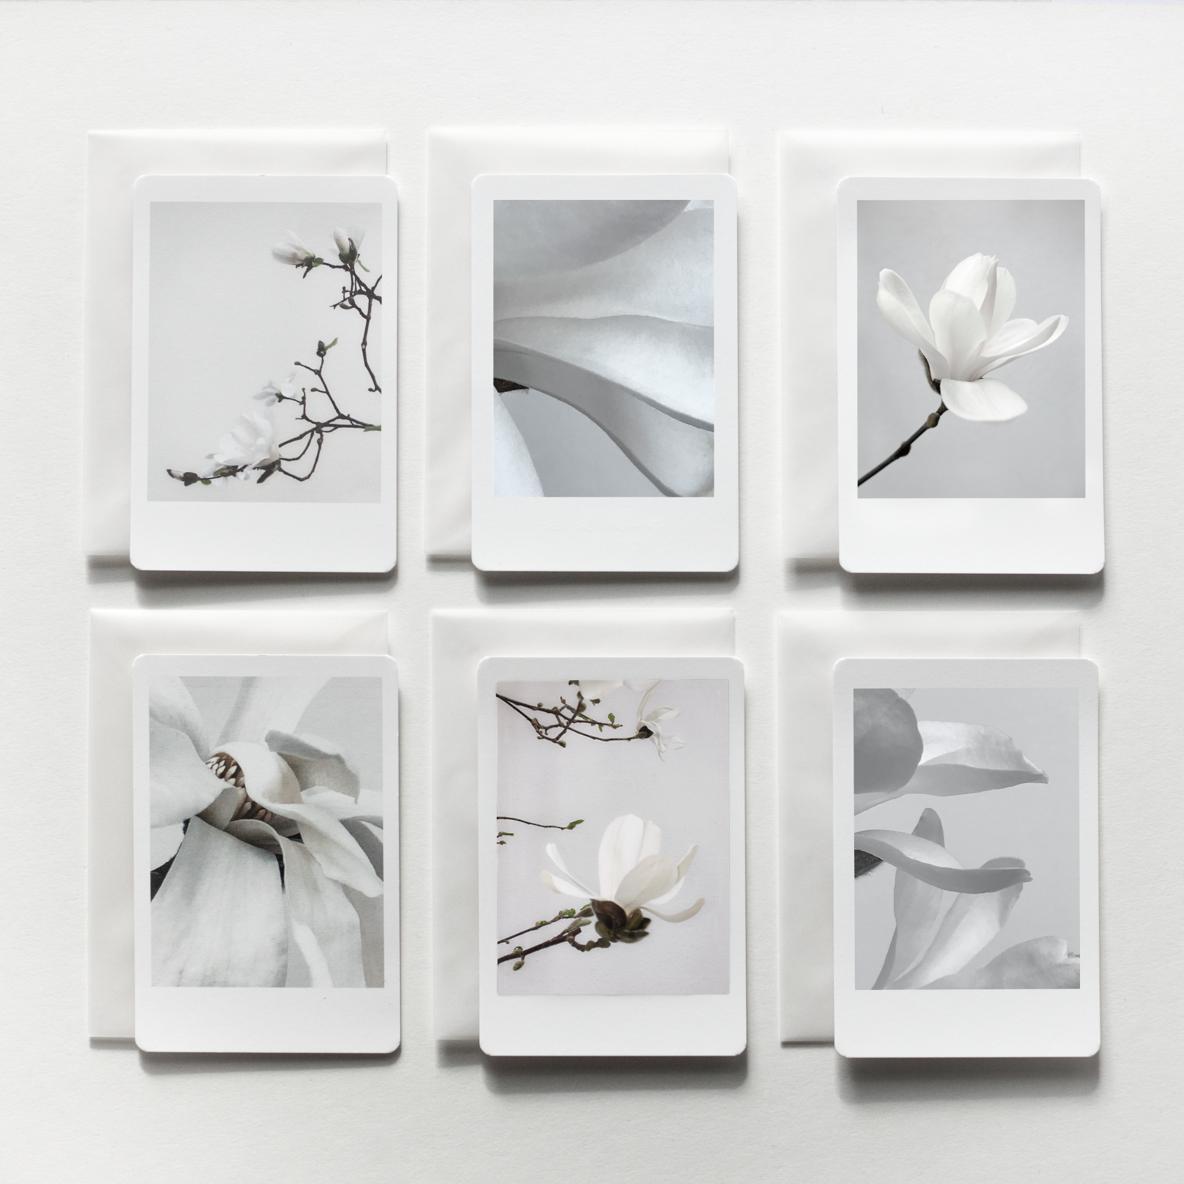 silke-lauffs-magnolia-days-überblick